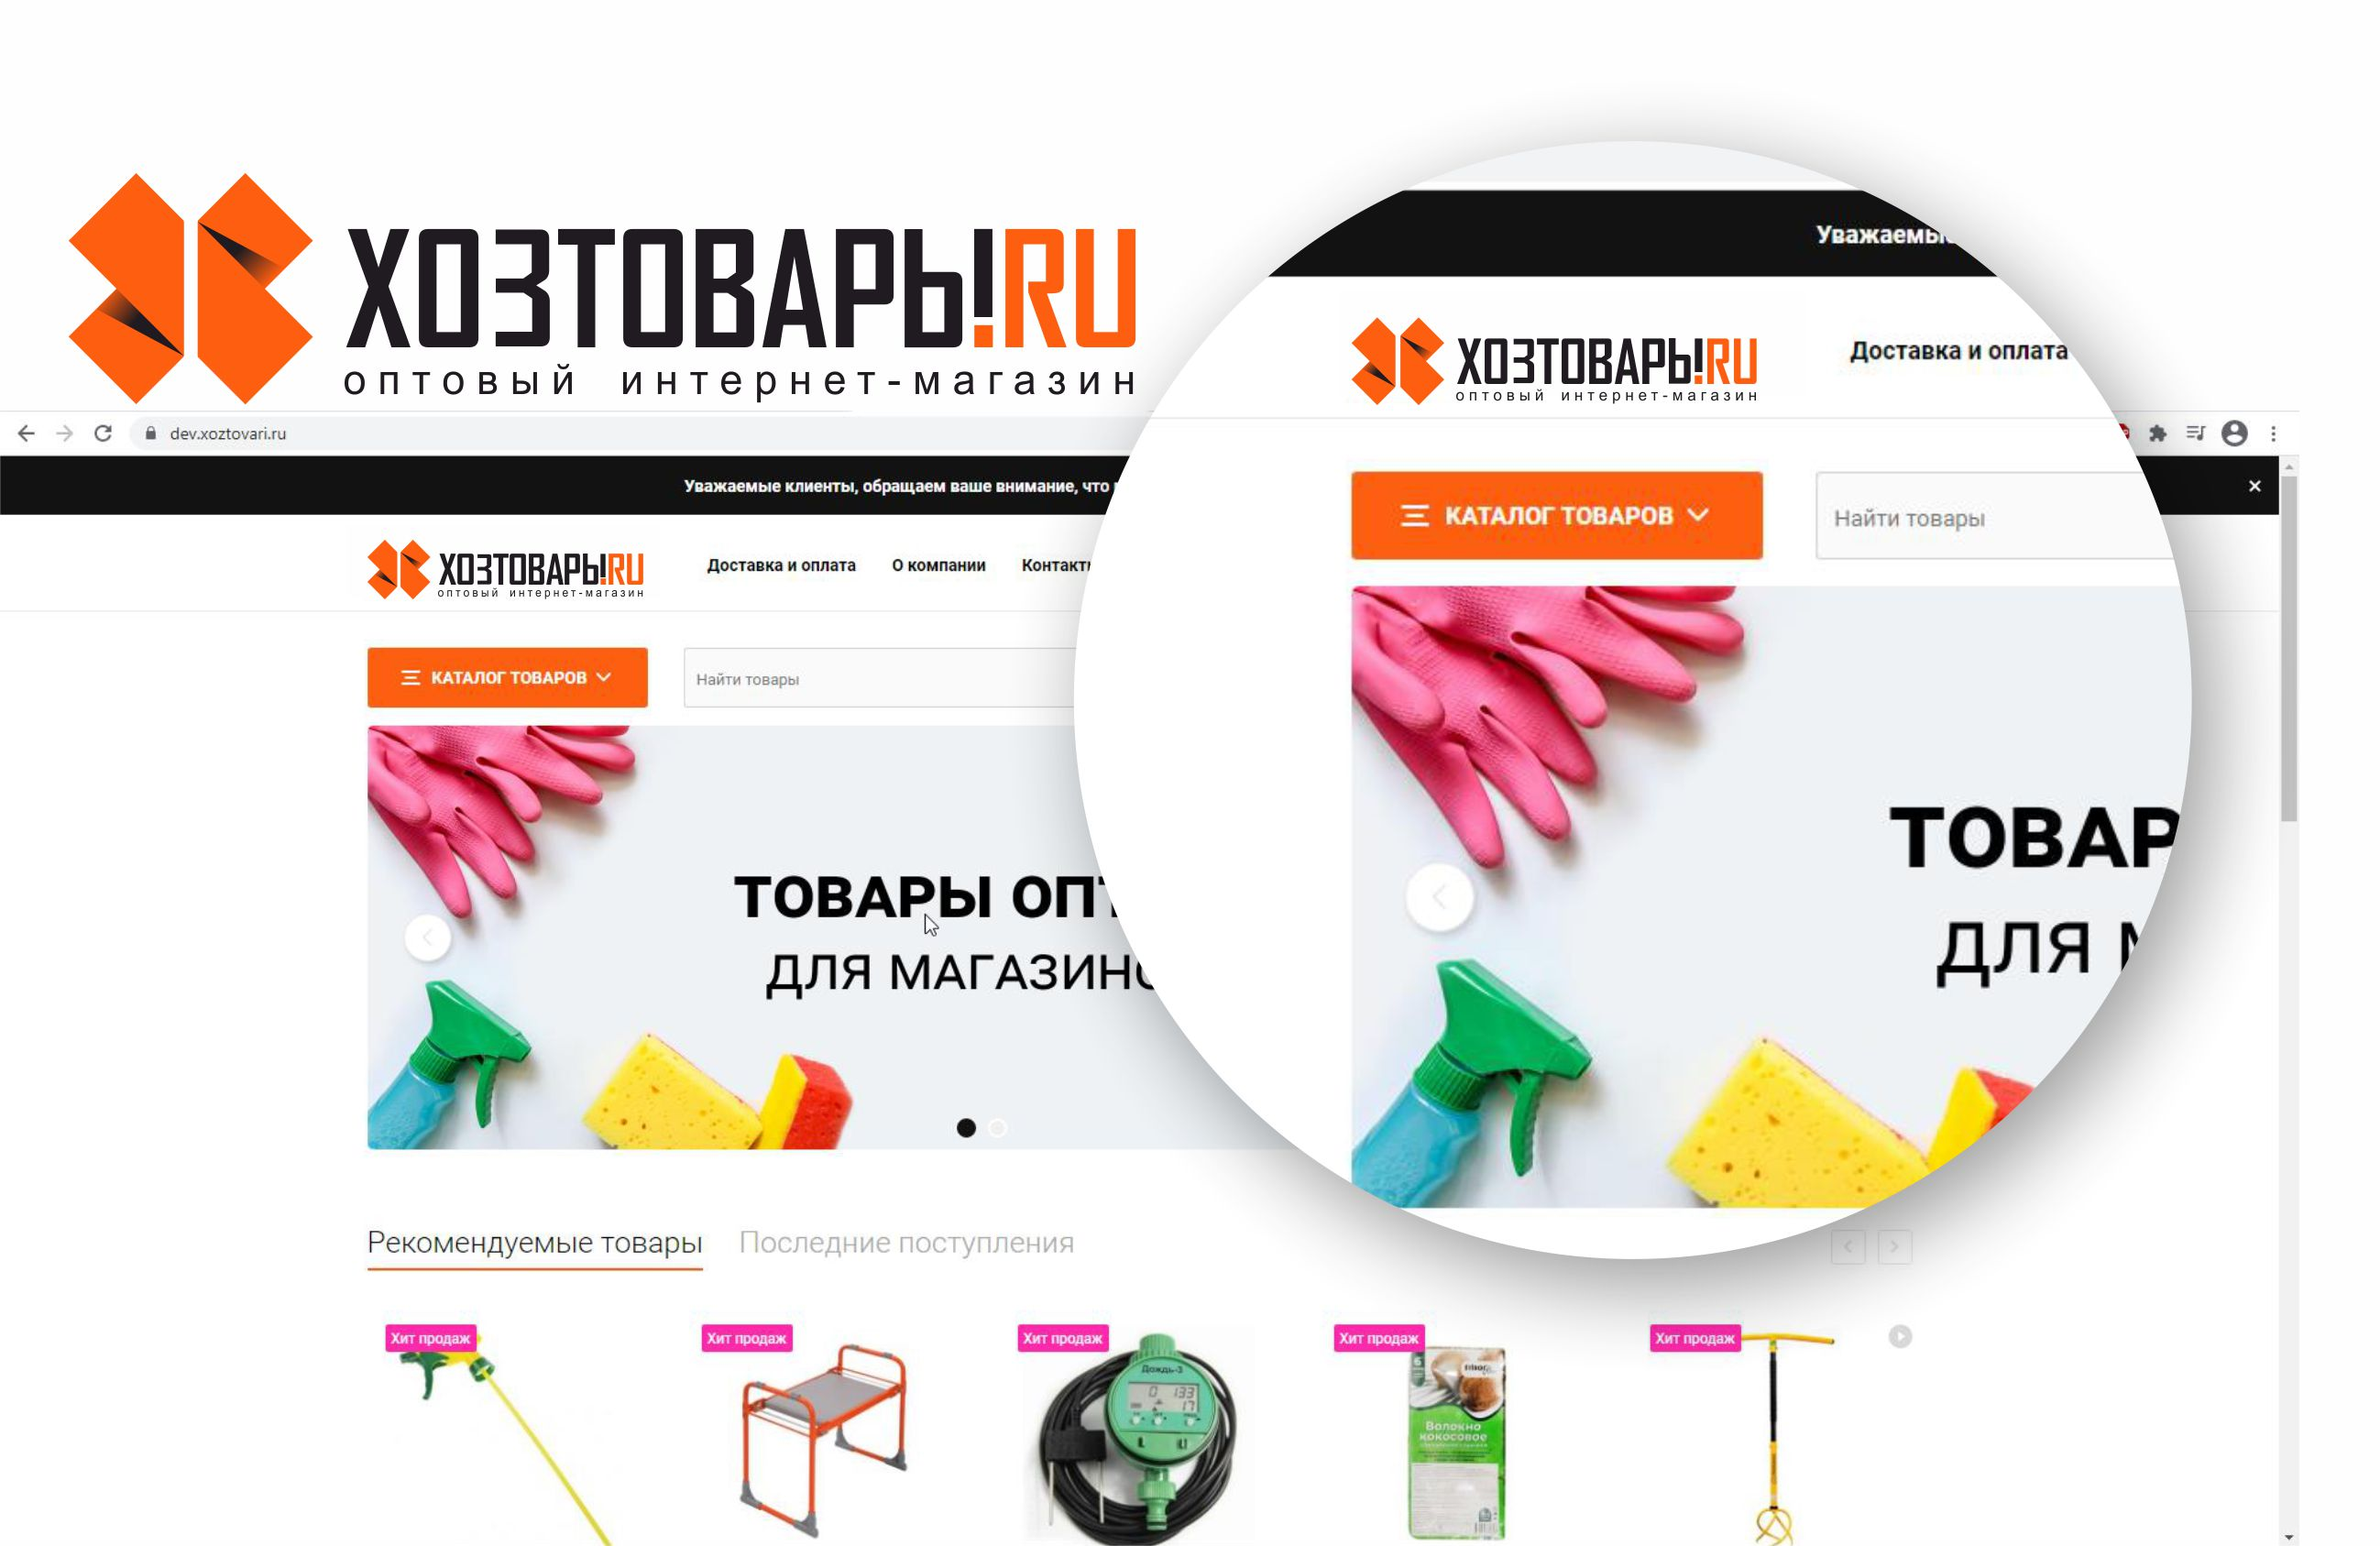 Разработка логотипа для оптового интернет-магазина «Хозтовары.ру» фото f_42560718f1e4d9ae.jpg